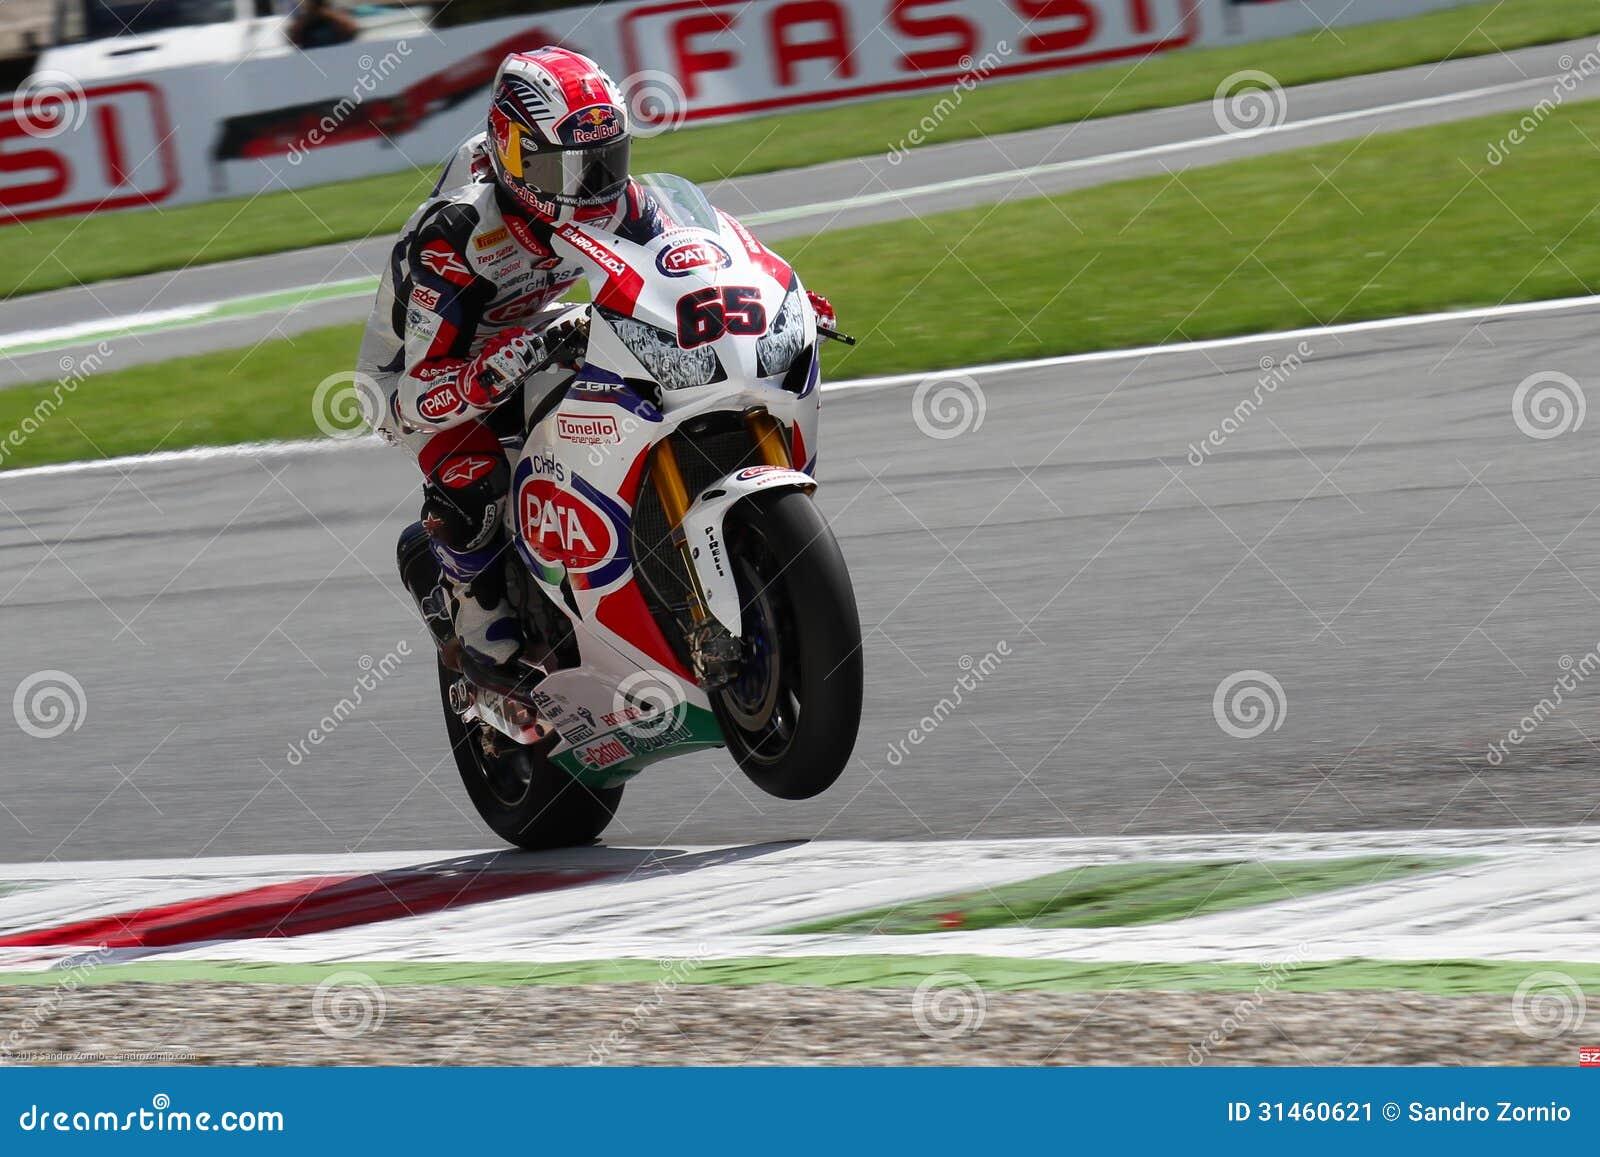 Jonathan Rea #65 on Honda CBR1000RR with Pata Honda World Superbike Team Superbike WSBK